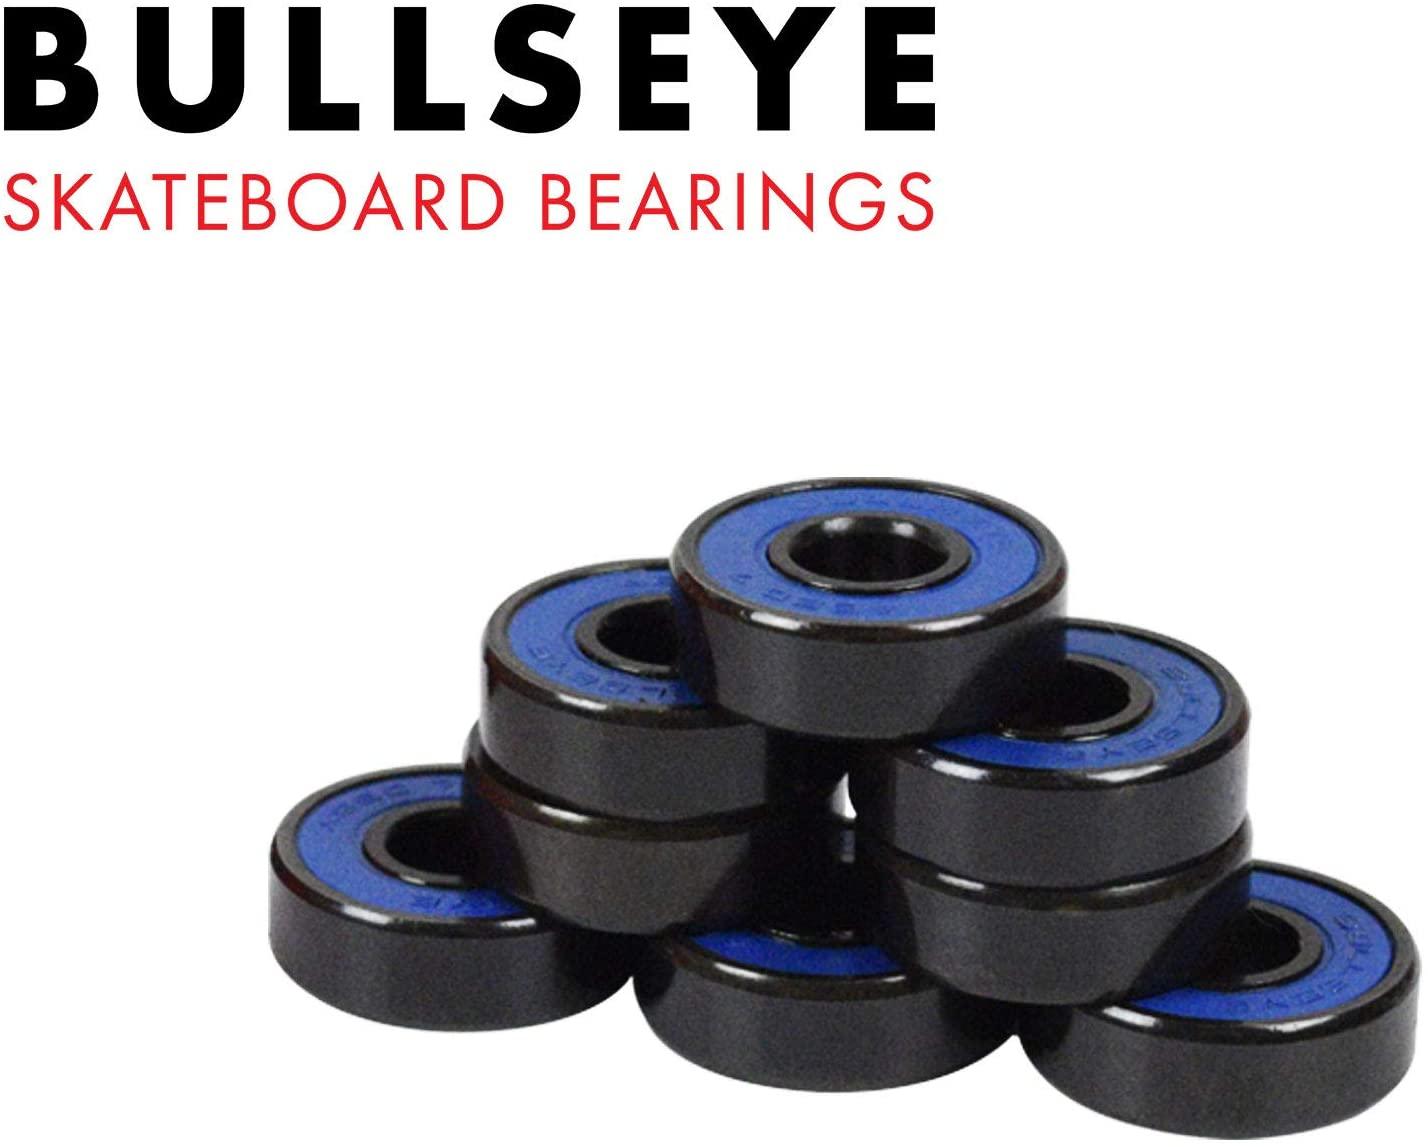 Bullseye Skateboard Bearings ABEC 7 Rated Set 8 Chrome Serviceable Ball Bearings